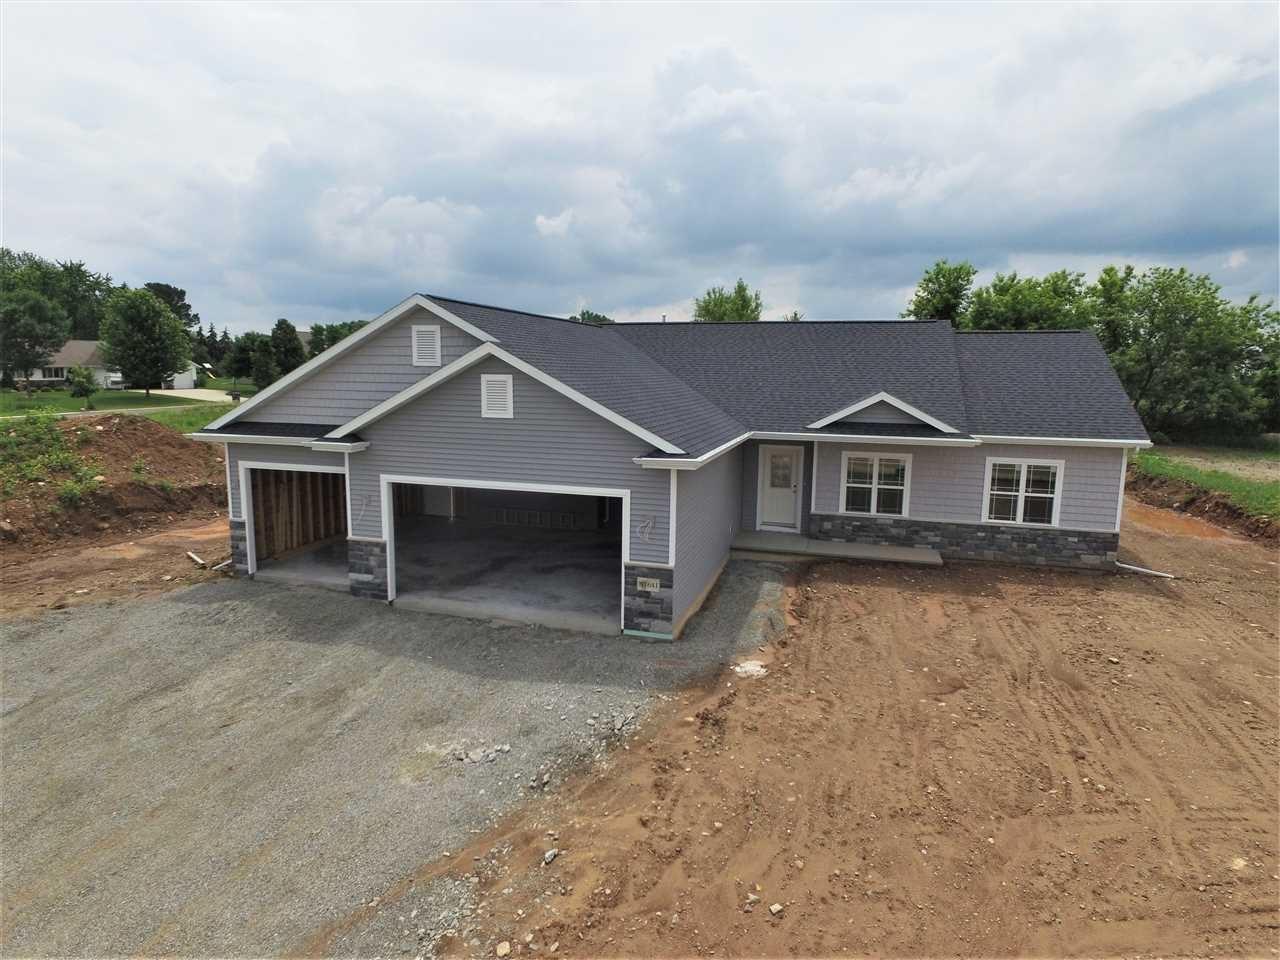 1155 ESTHER ANN Lane, Hortonville, WI 54944 - MLS#: 50235132